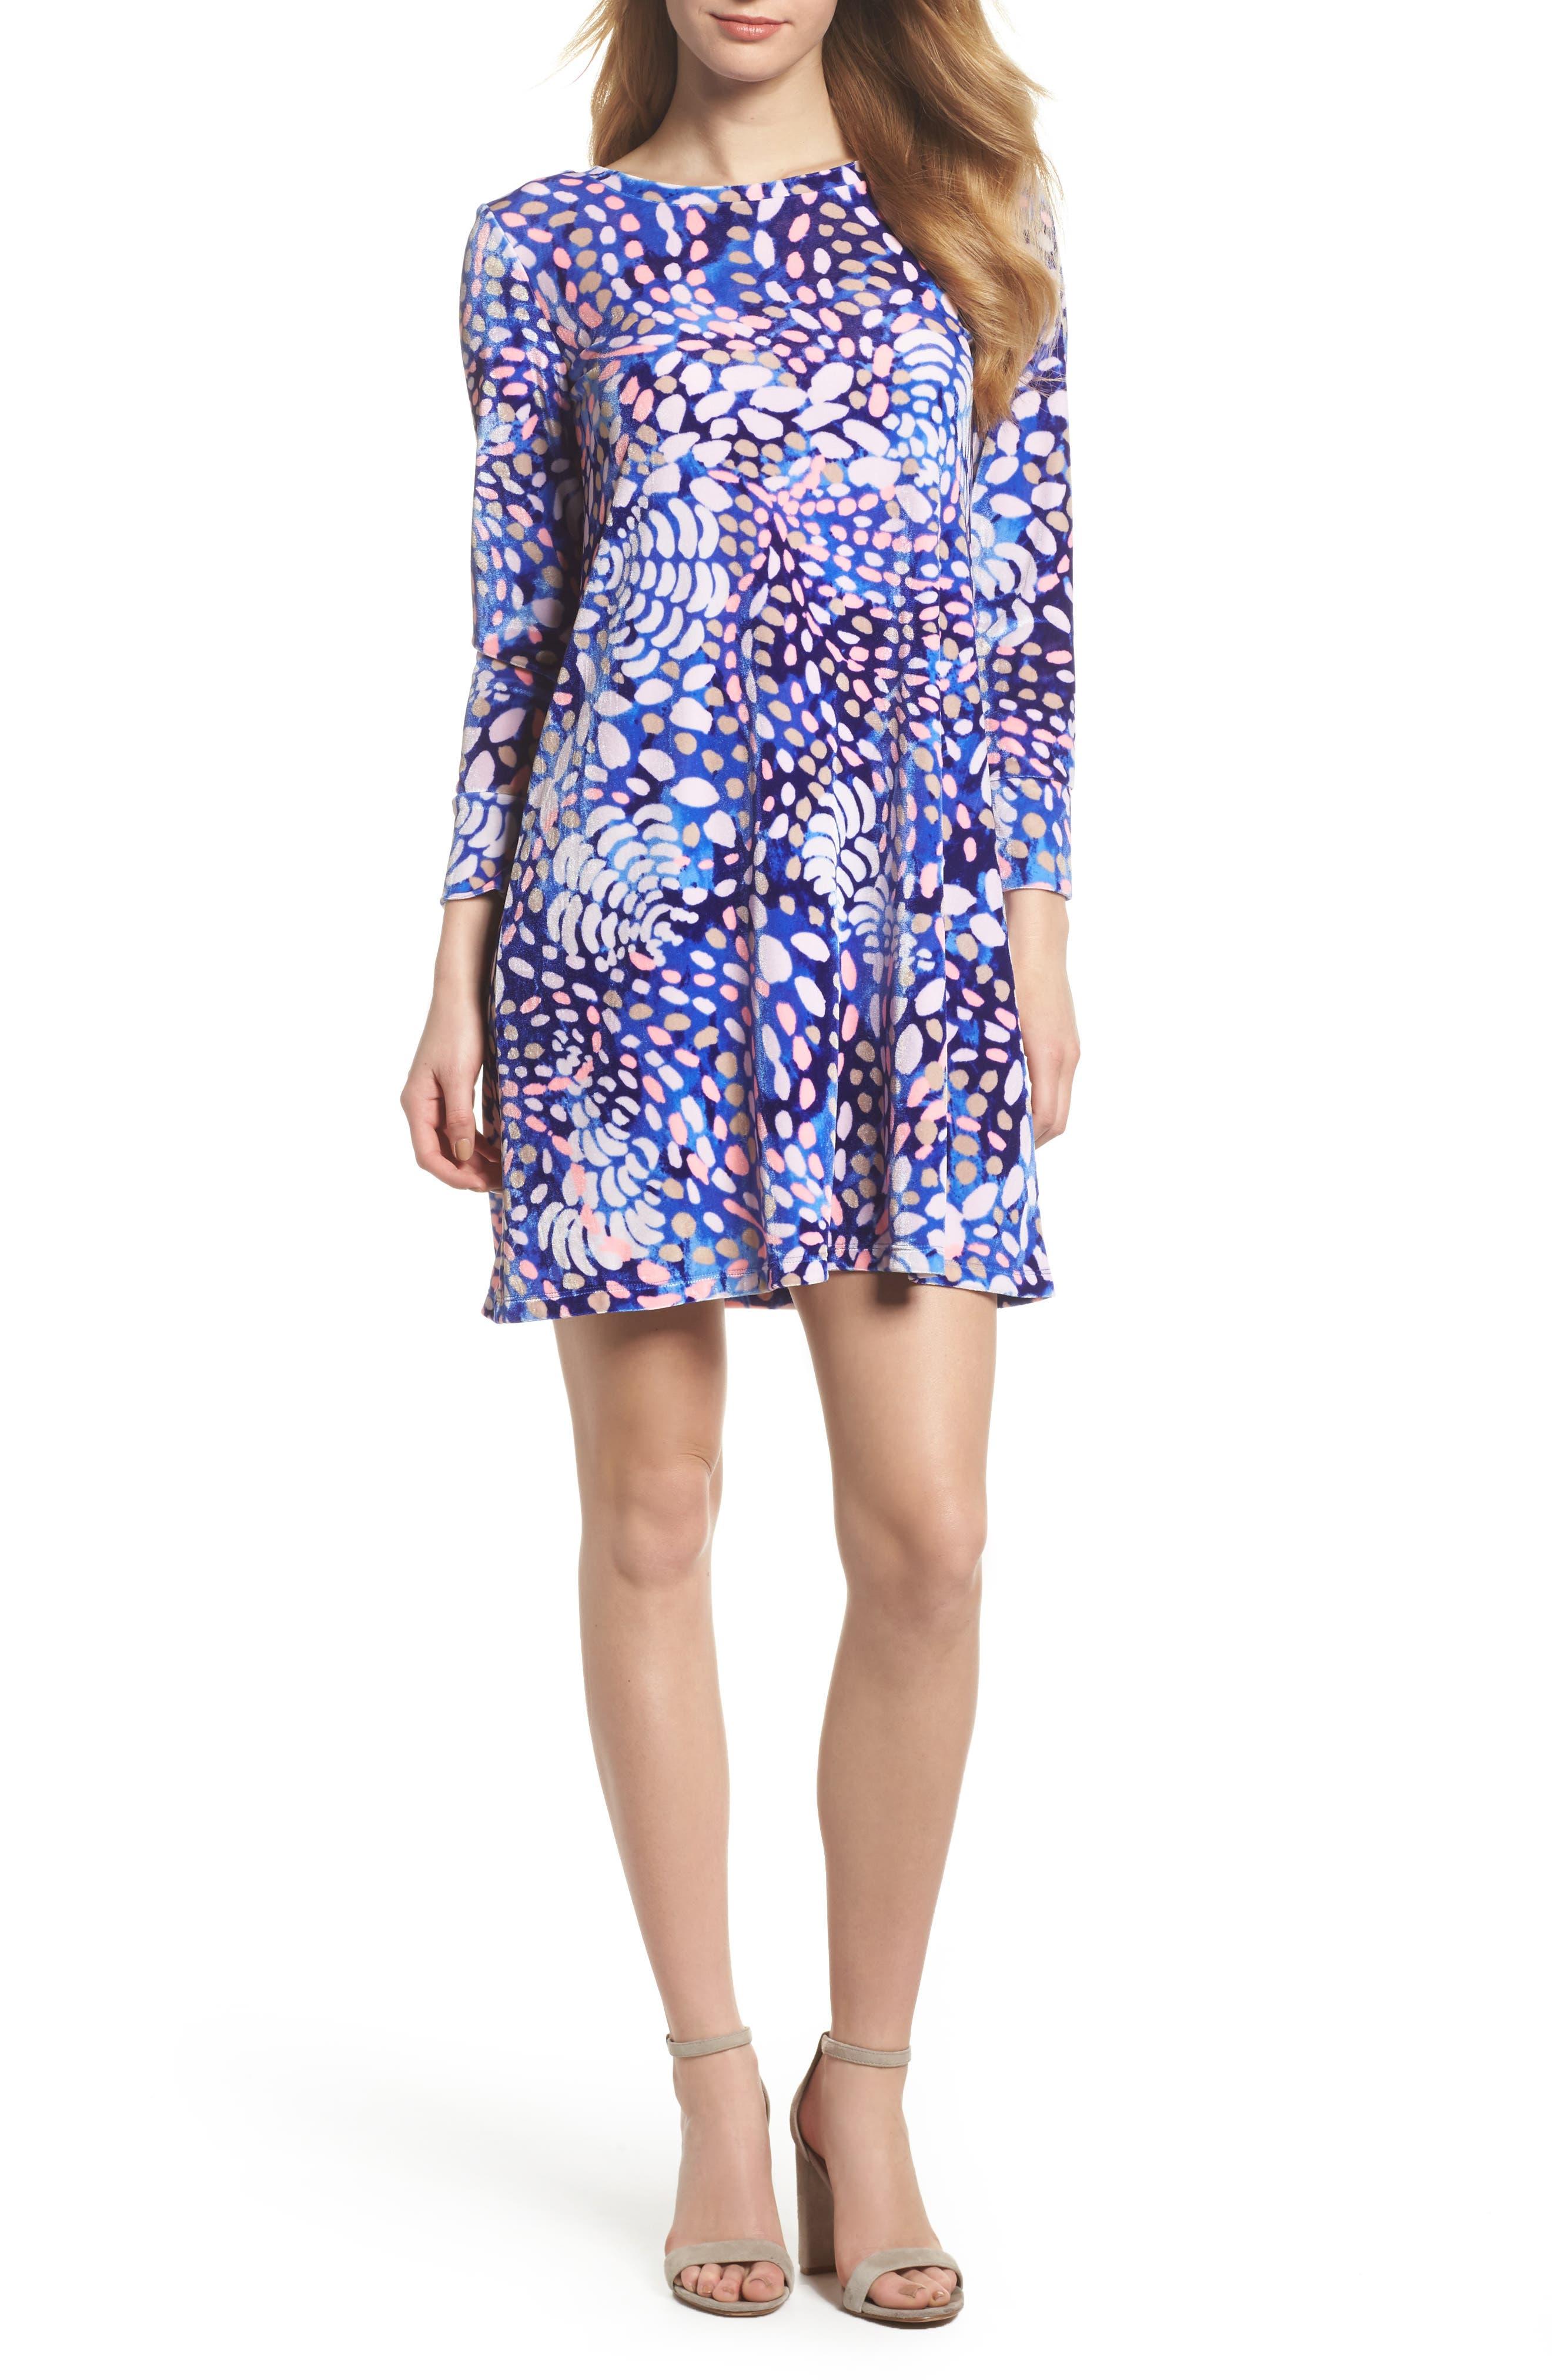 Olive Swing Dress,                         Main,                         color, Beckon Blue Sparkling Grotto